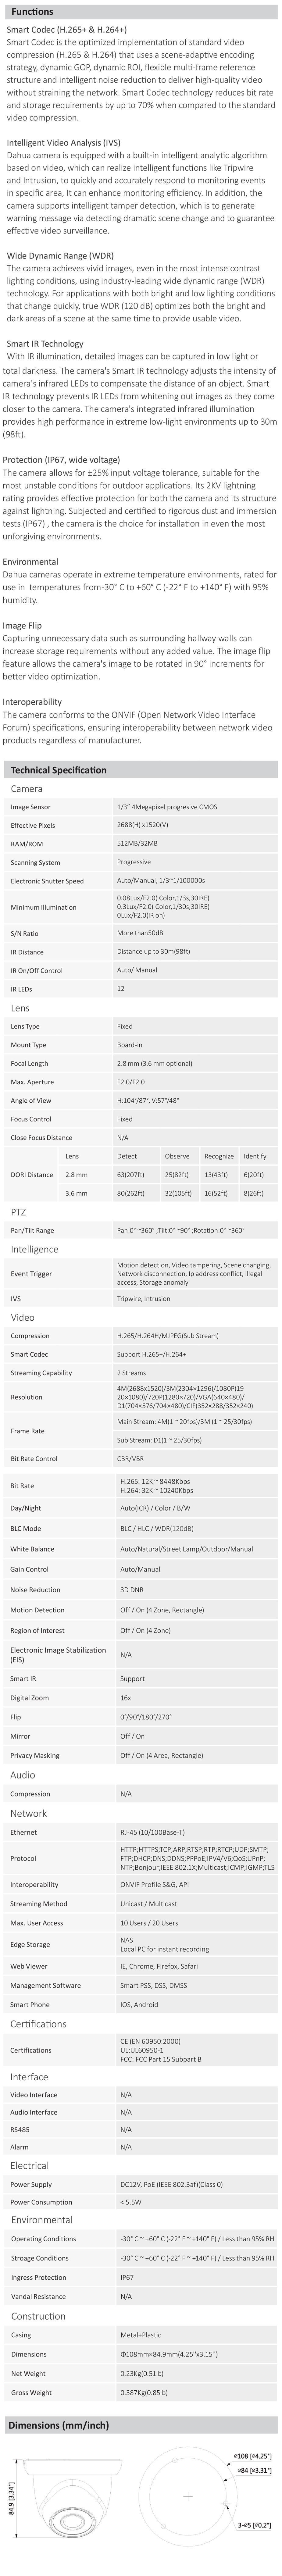 Dahua DH-IPC-HDW1431S 4MP WDR IR Eyeball Network Camera - Overview 1